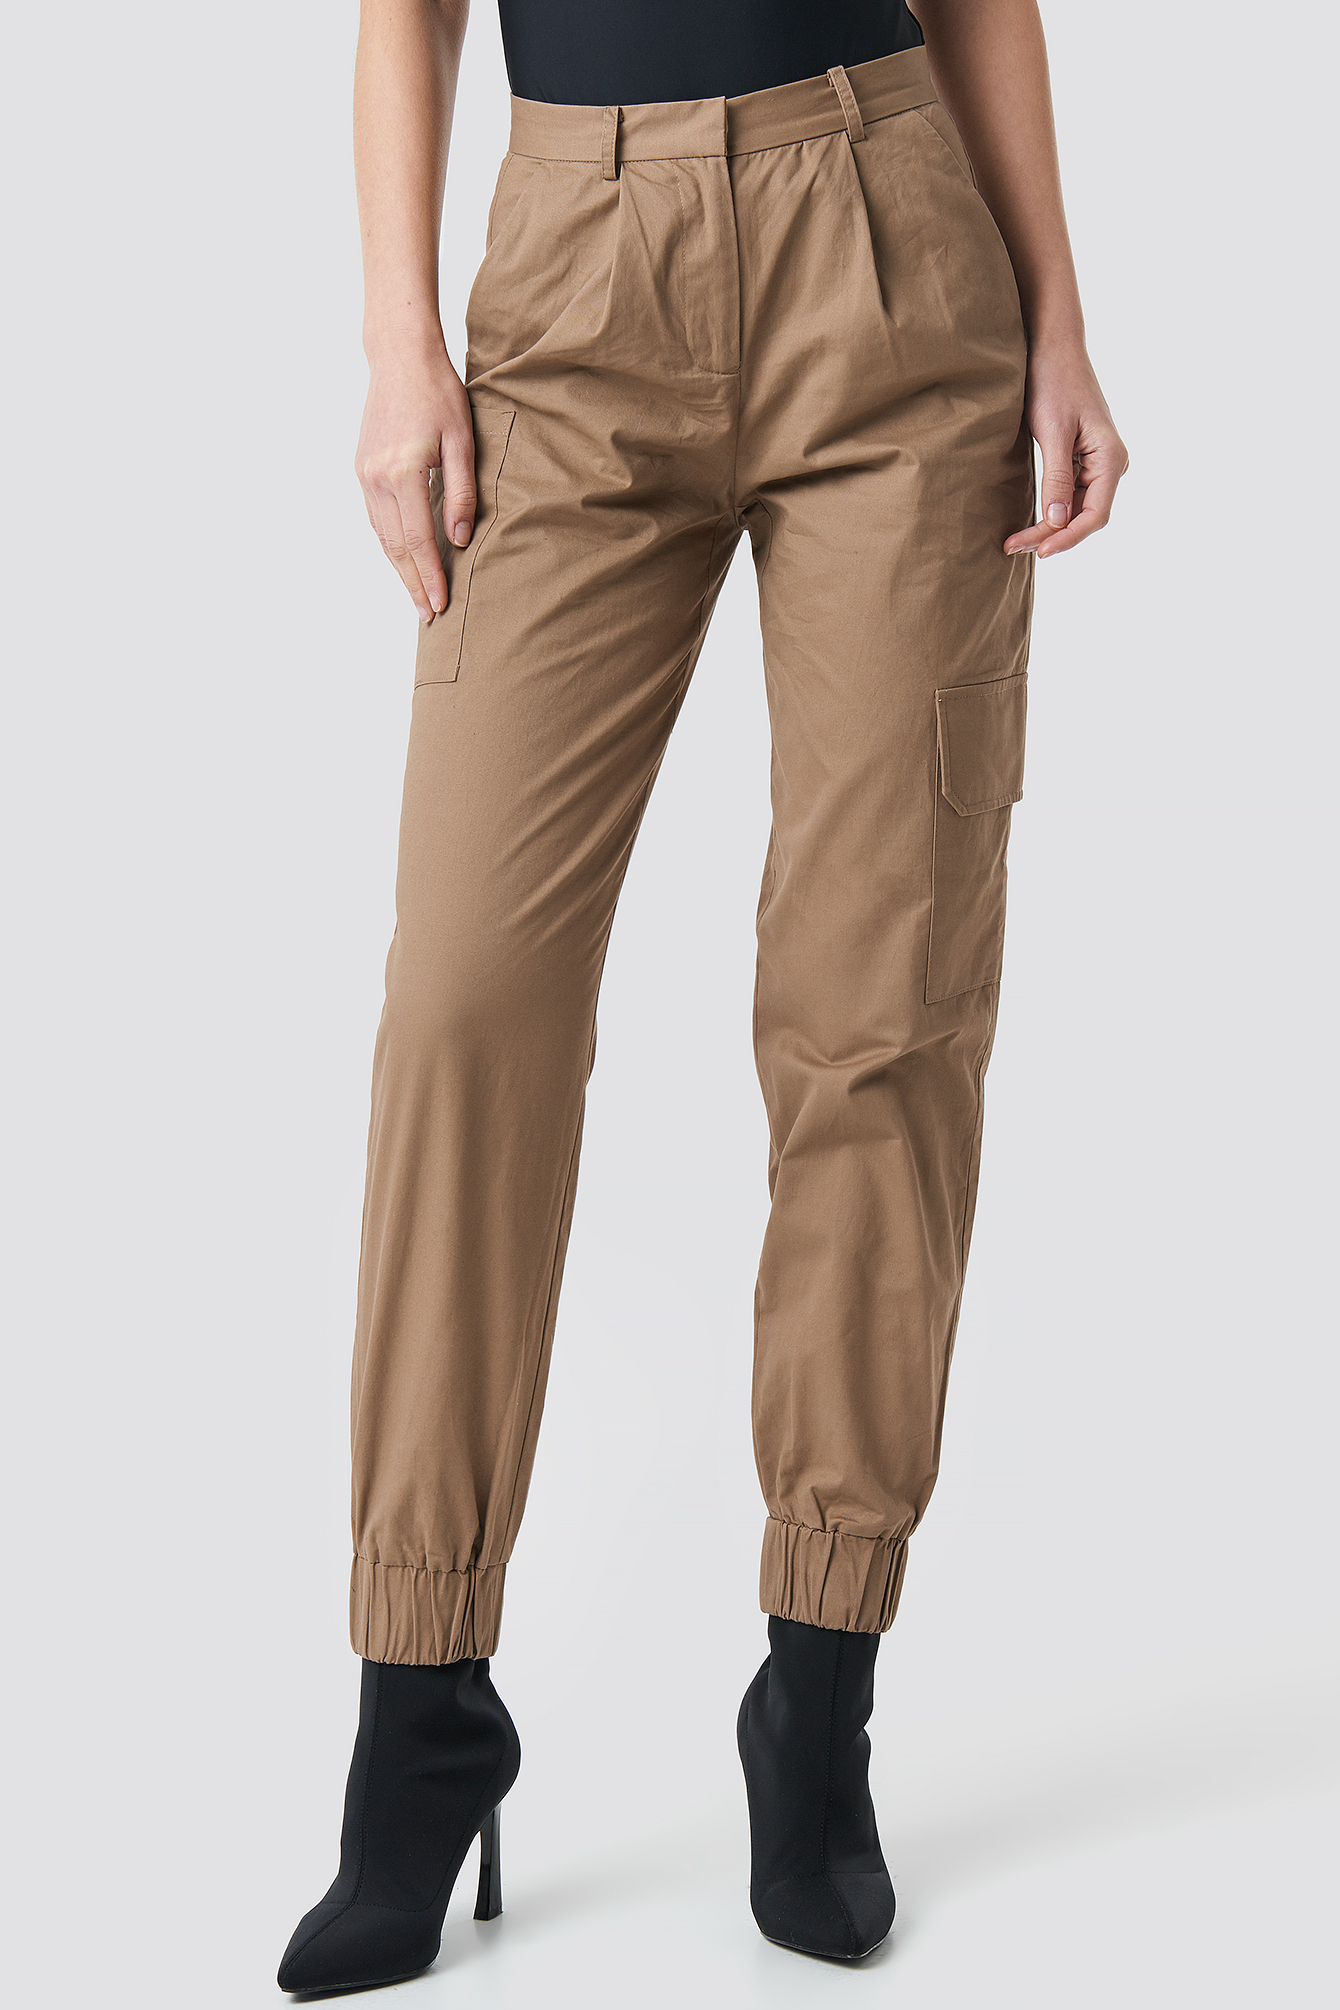 Patch Pocket Cuff Detail Pants NA-KD.COM